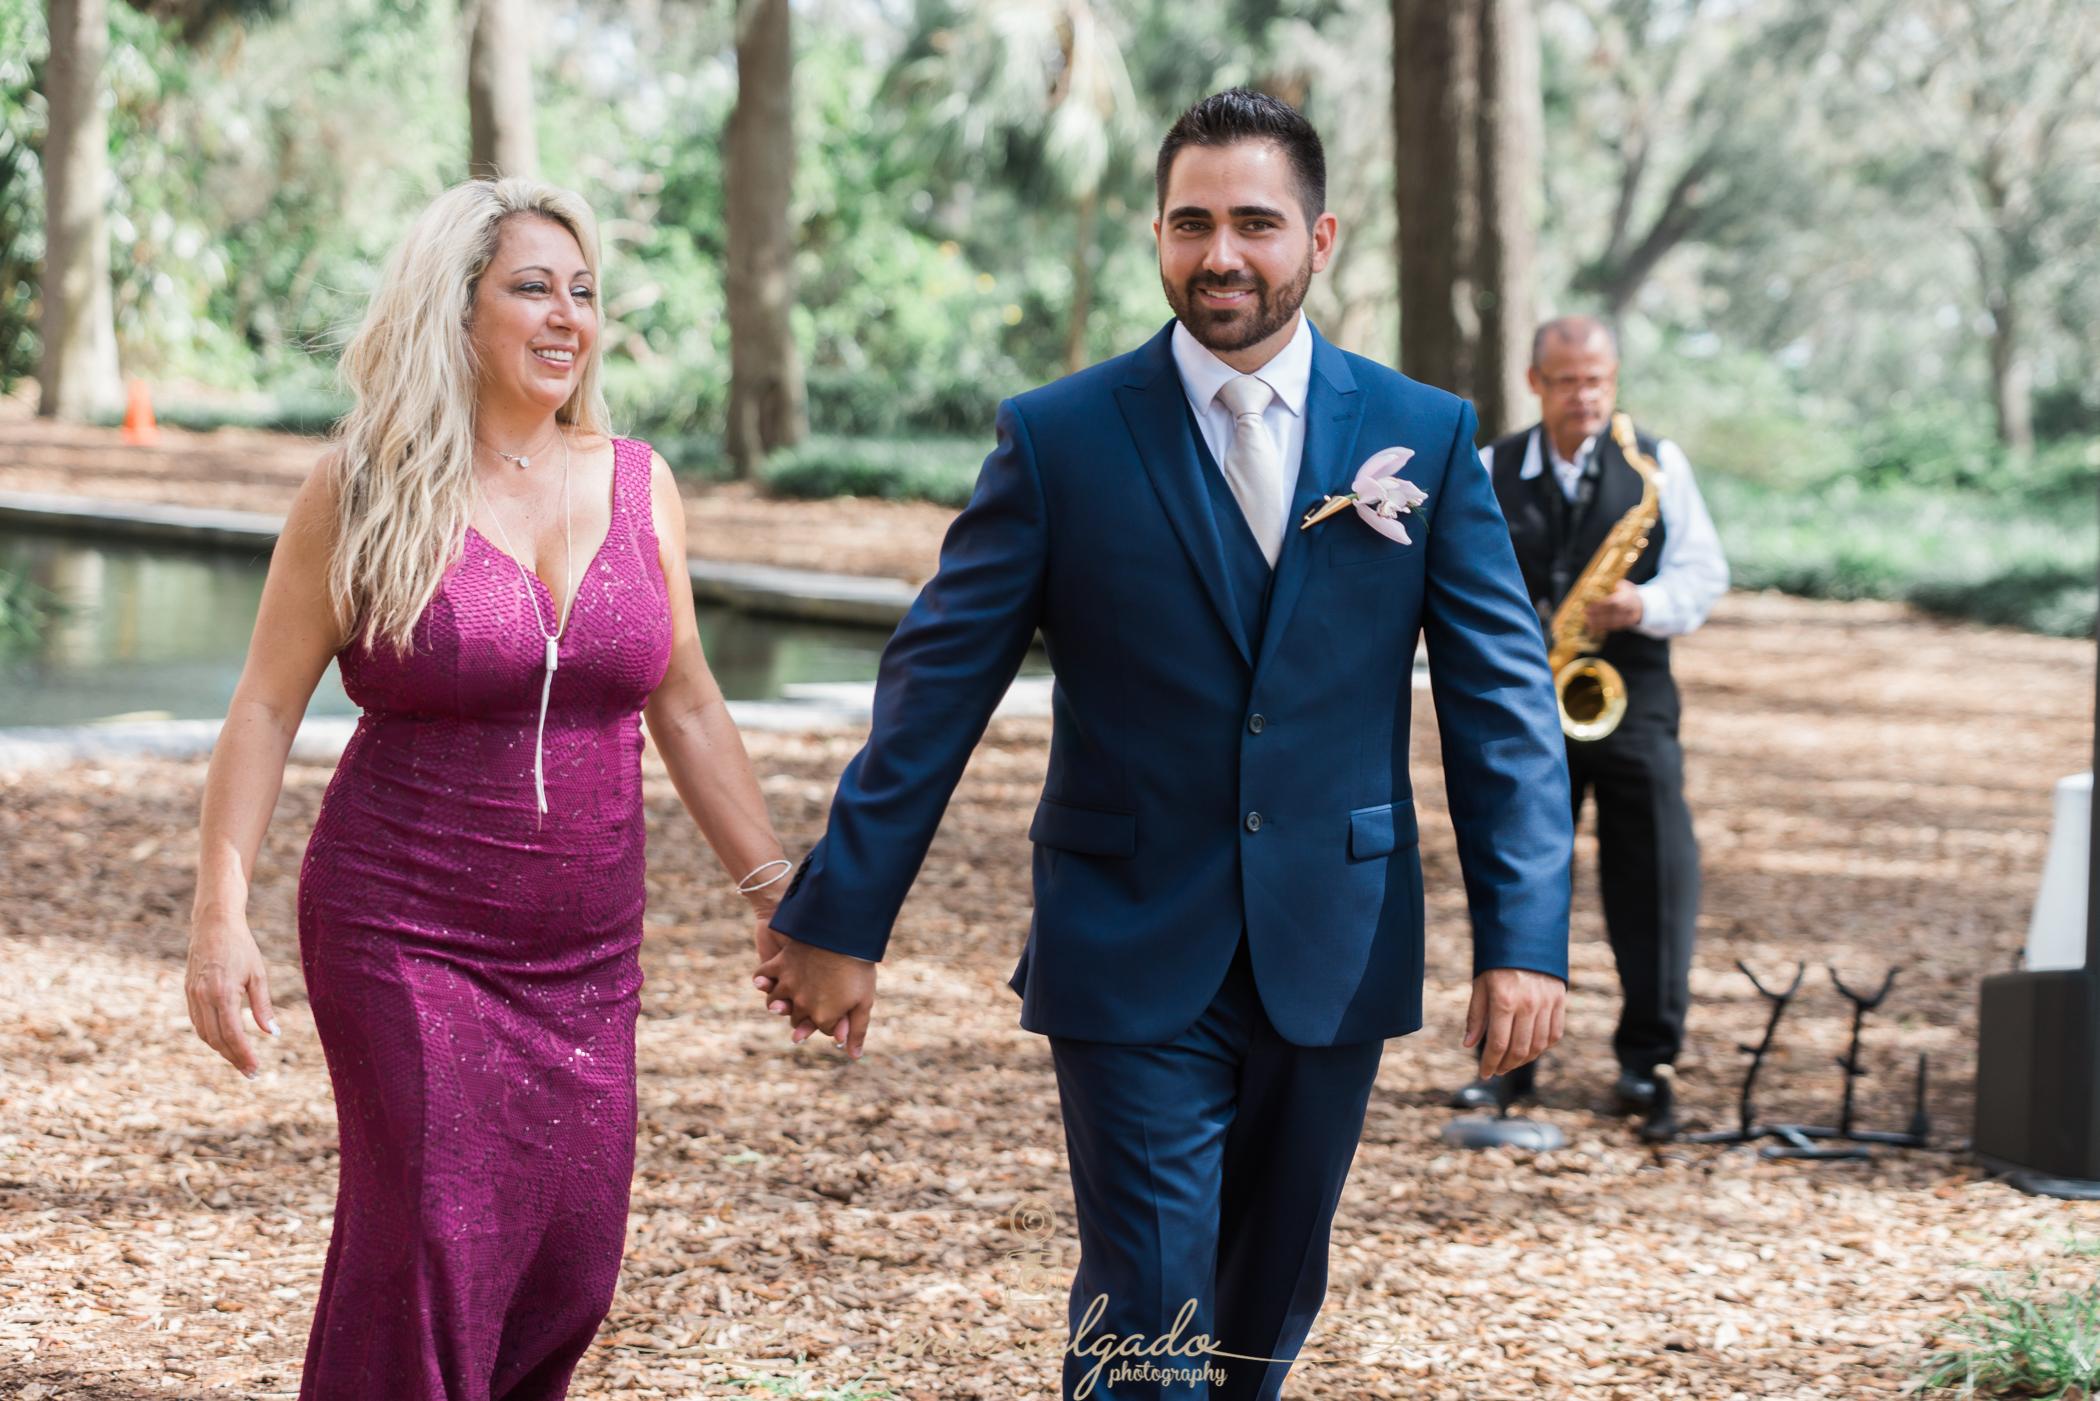 Bok-tower-gardens-wedding-ceremony, Tampa-wedding